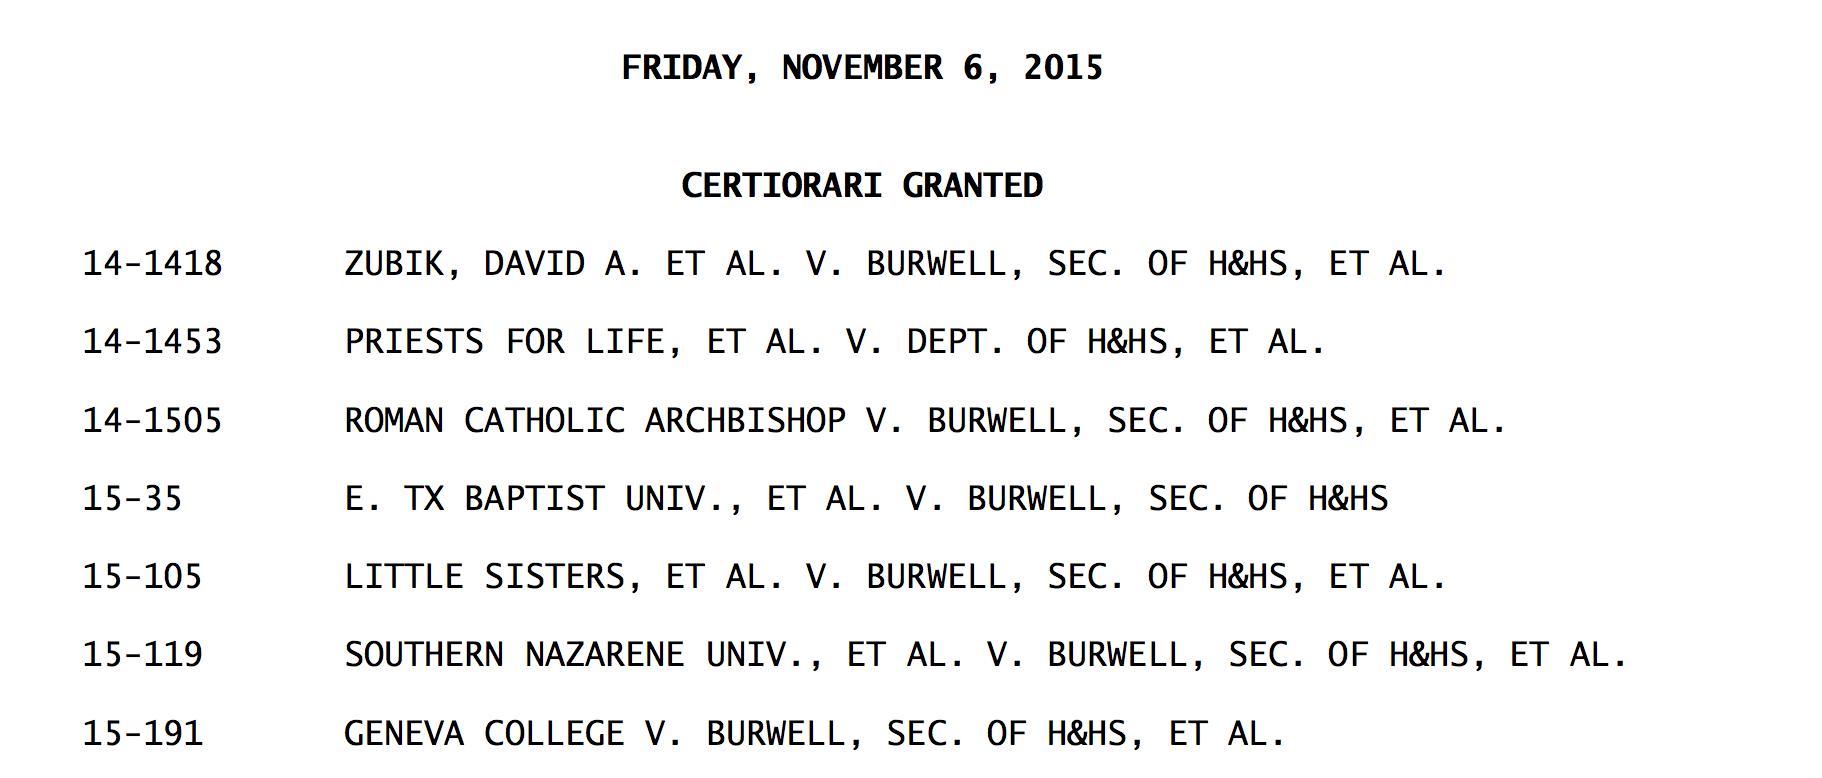 SCOTUS abortion pill list